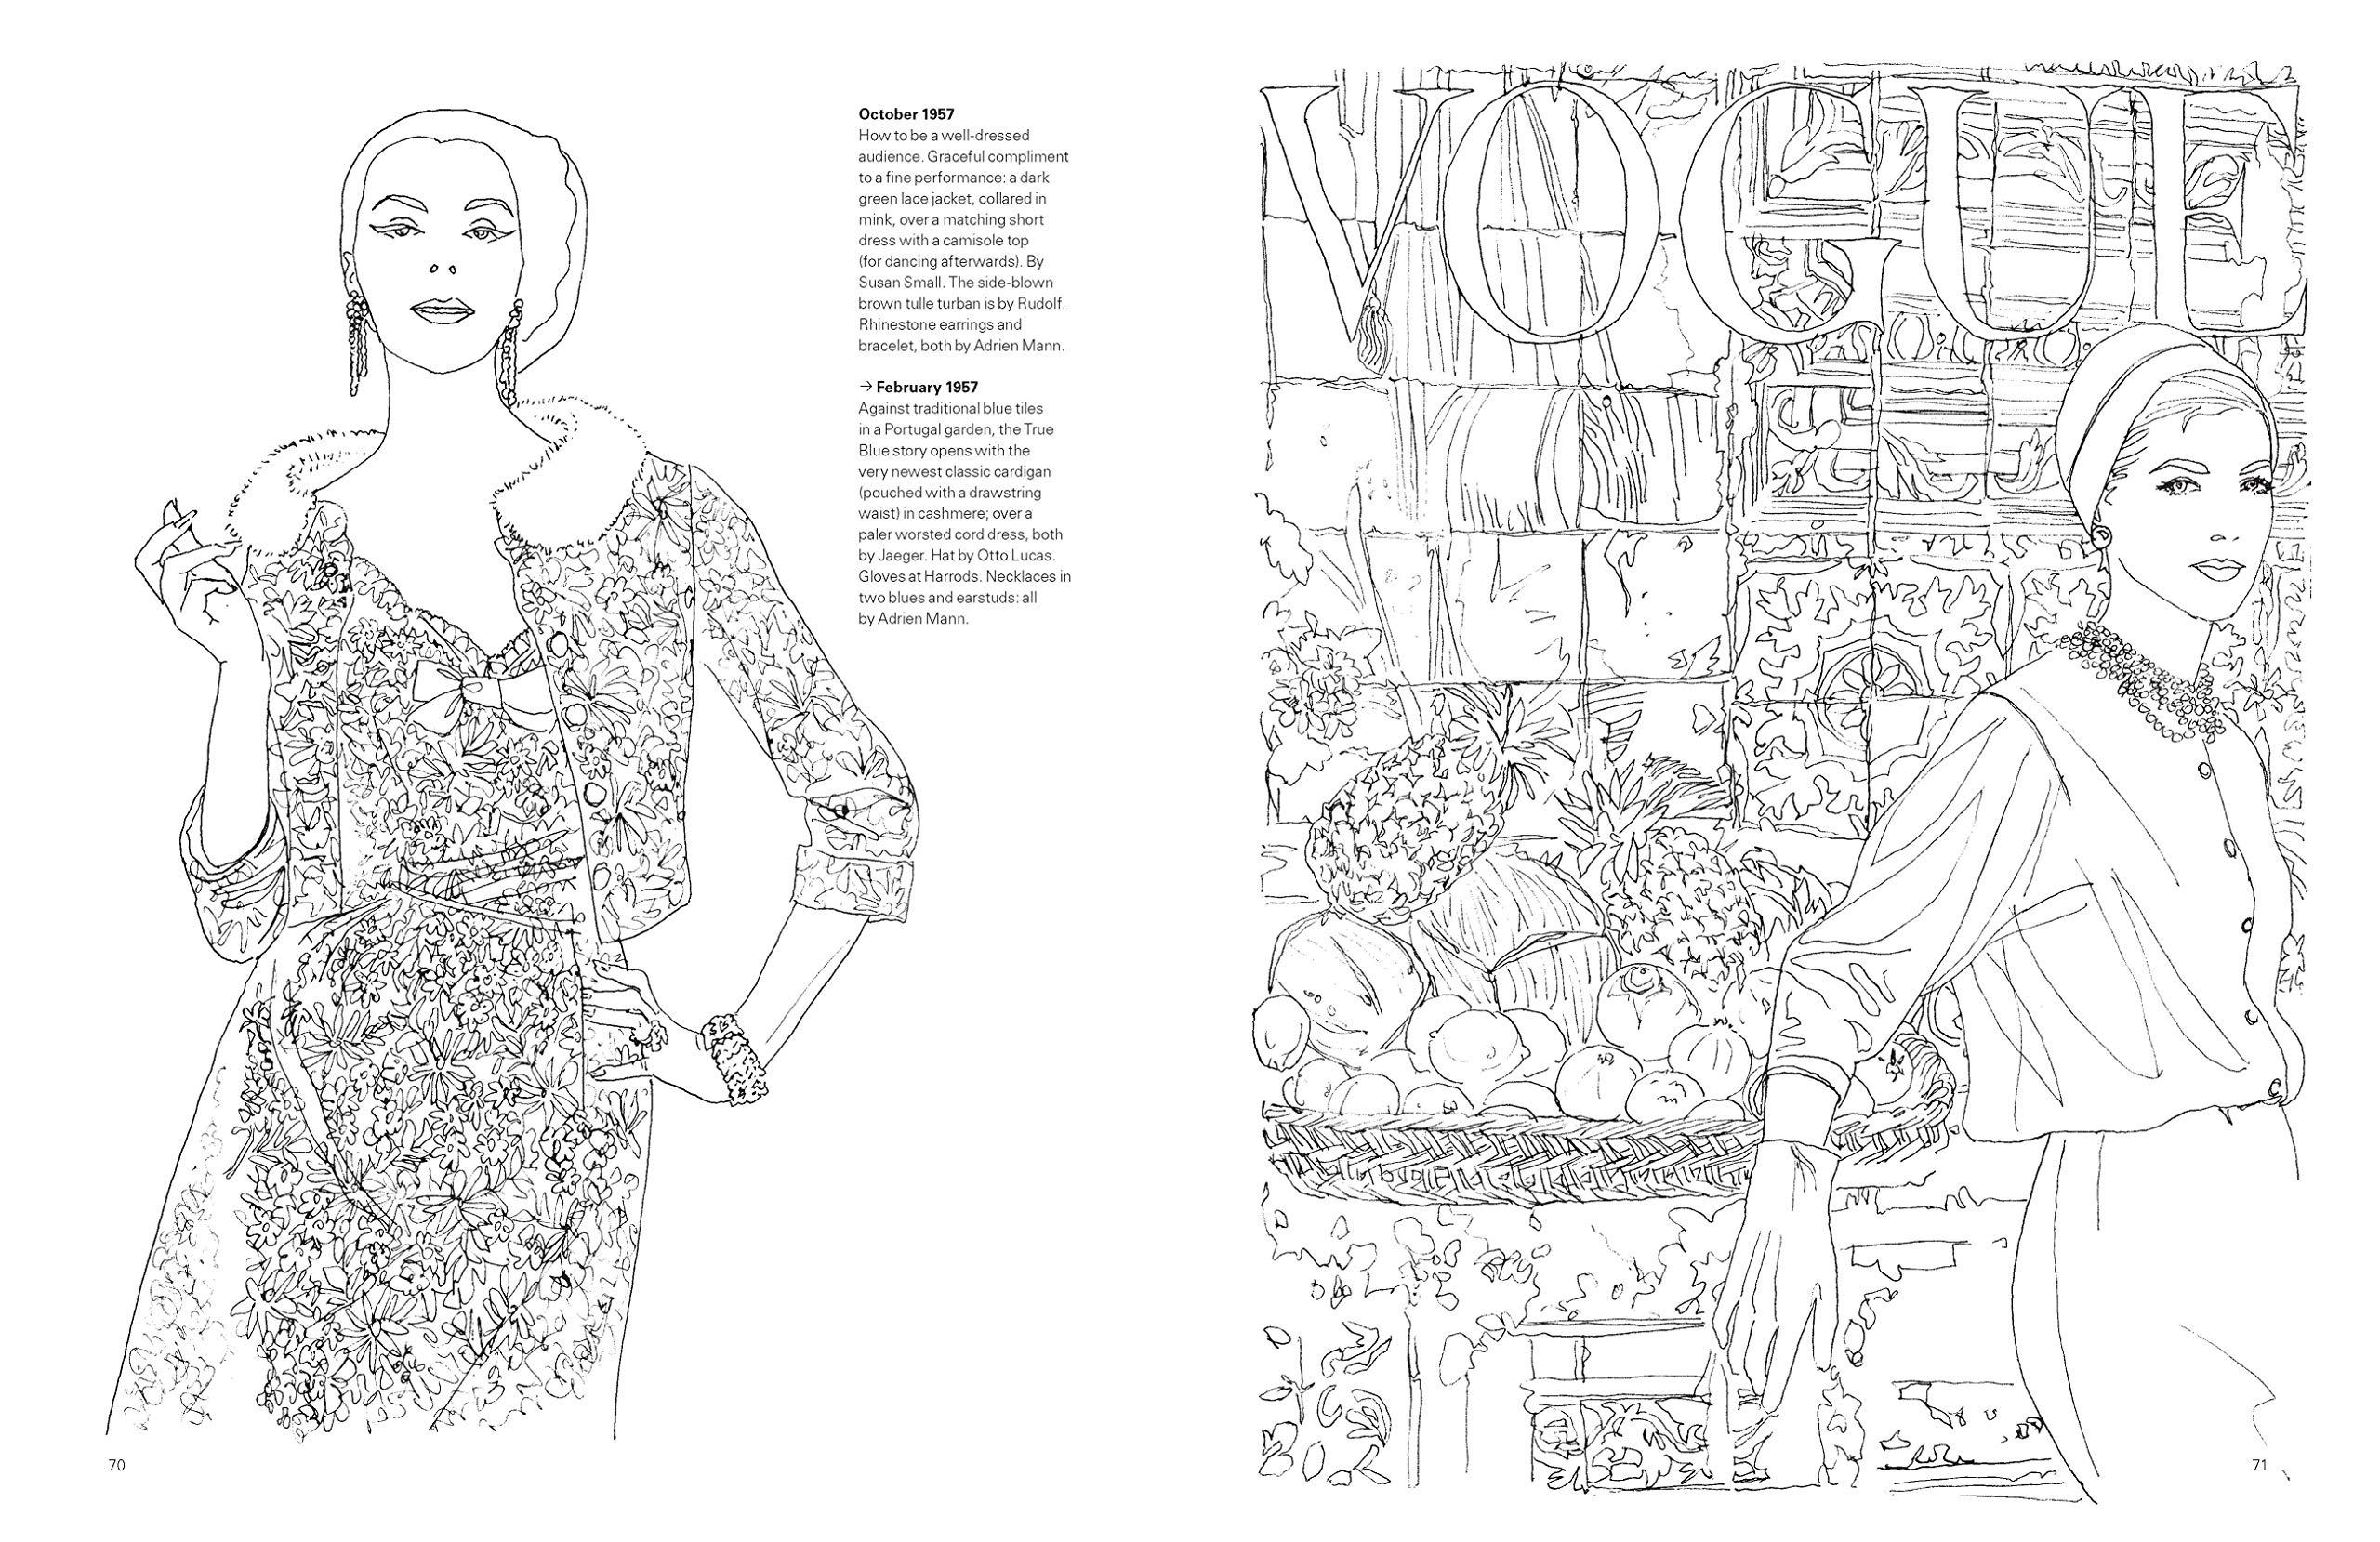 Vogue Colouring Book: Amazon.es: Webb, Iain: Libros en idiomas extranjeros